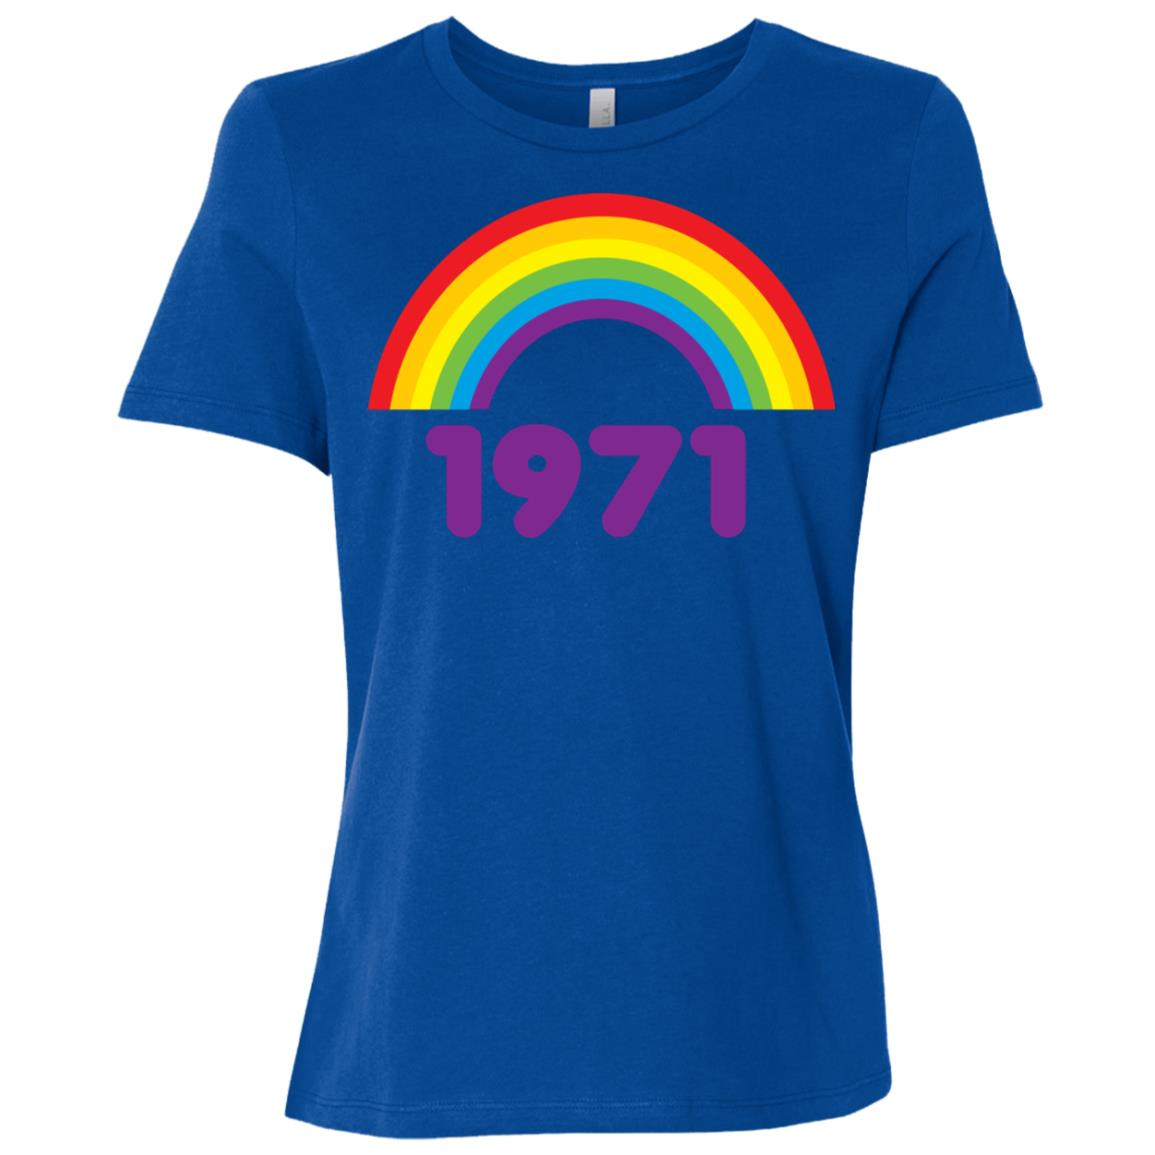 70s s for Women Vintage 1971 Rainbow Women Short Sleeve T-Shirt